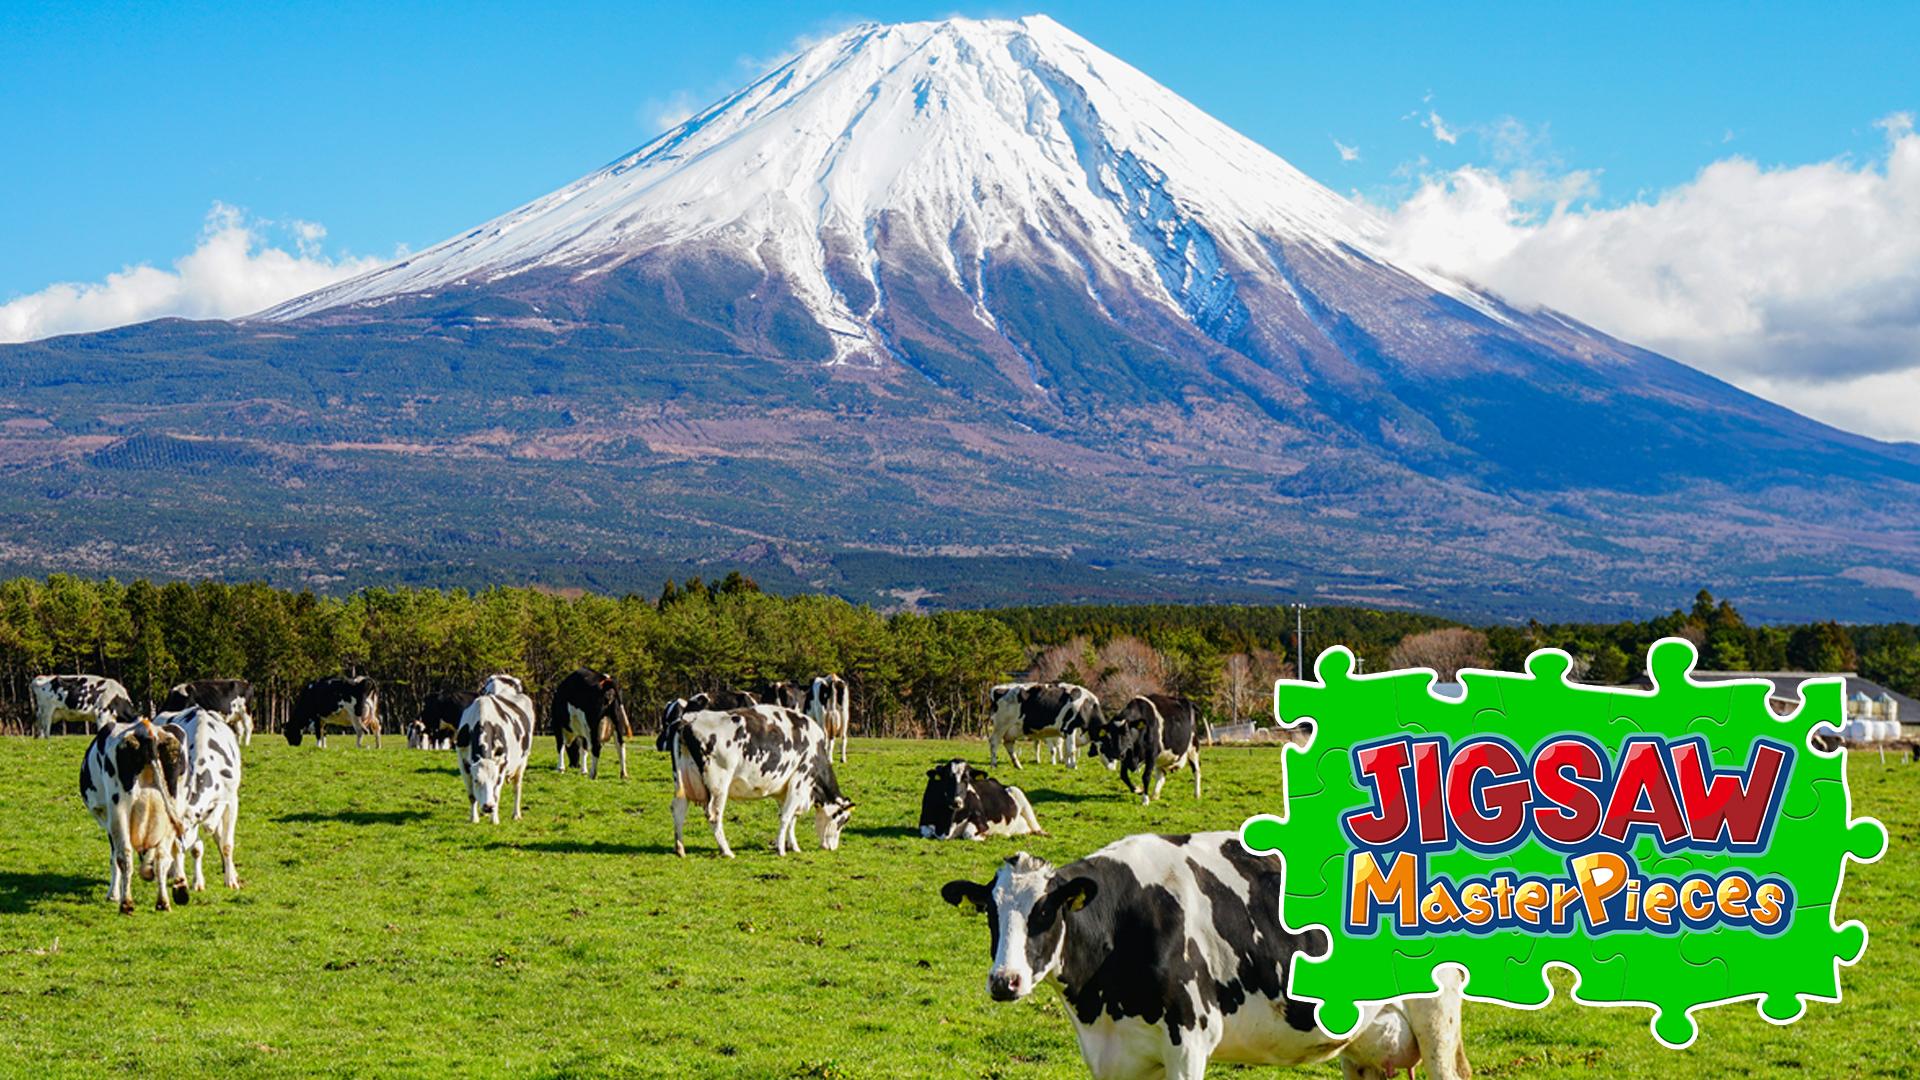 Fujiyama - Mountain Fuji -